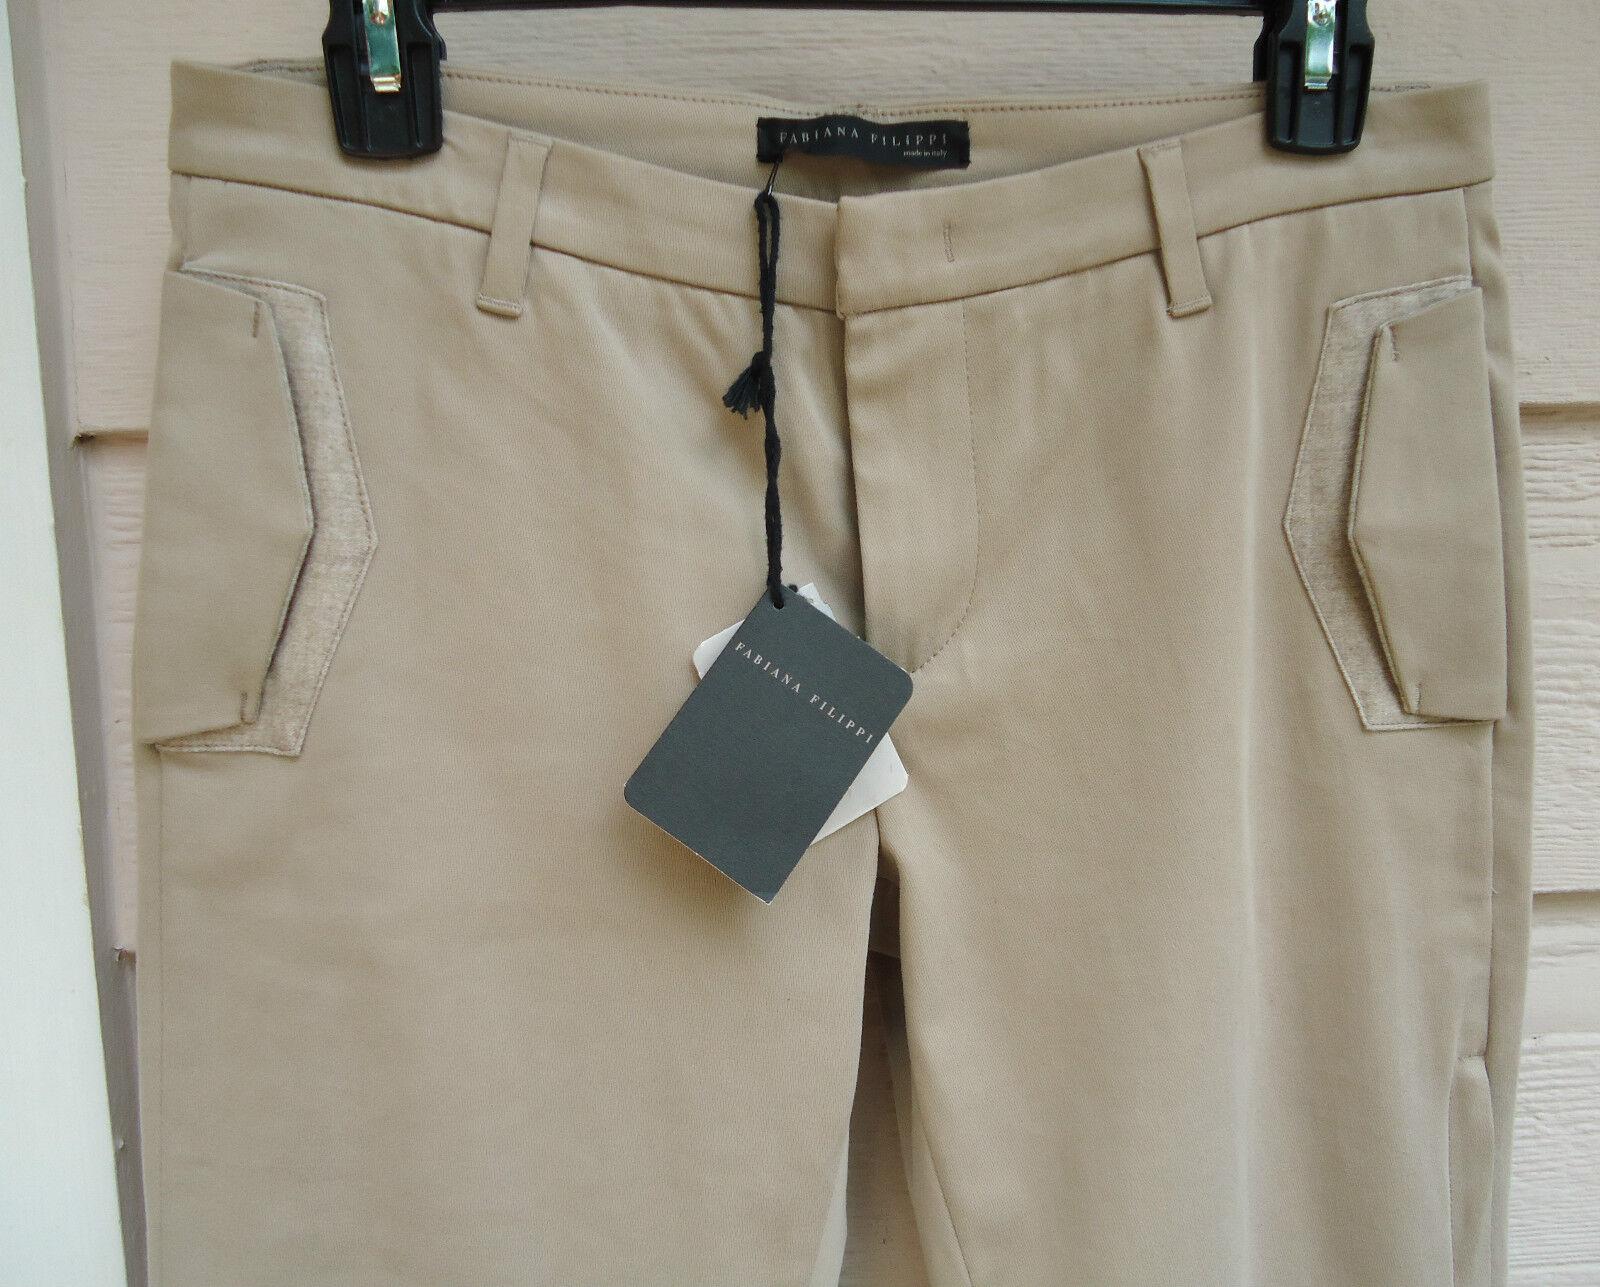 NEW  Fabiana Filippi Cotton Stretch Skinny Pant XS 40 Natural Tan Equestrian